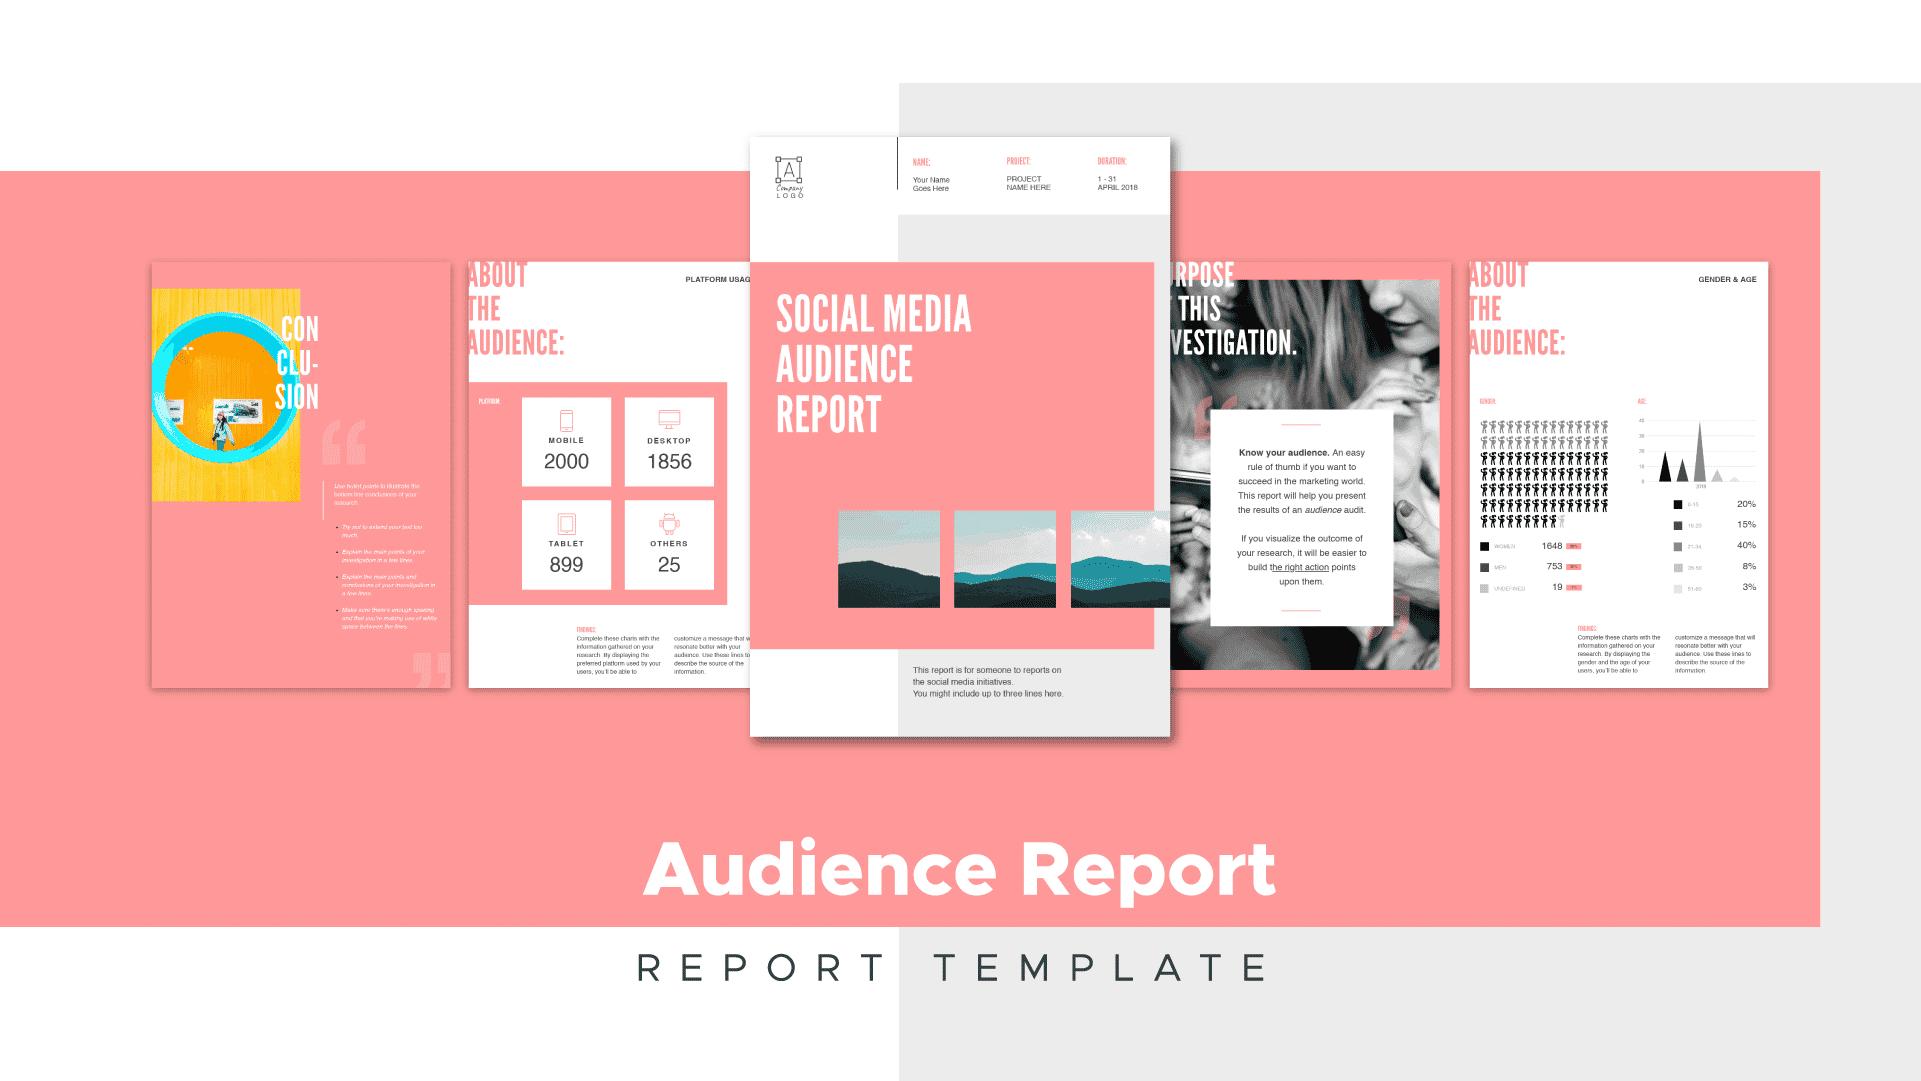 templates-visual_report_1143-1-5621072